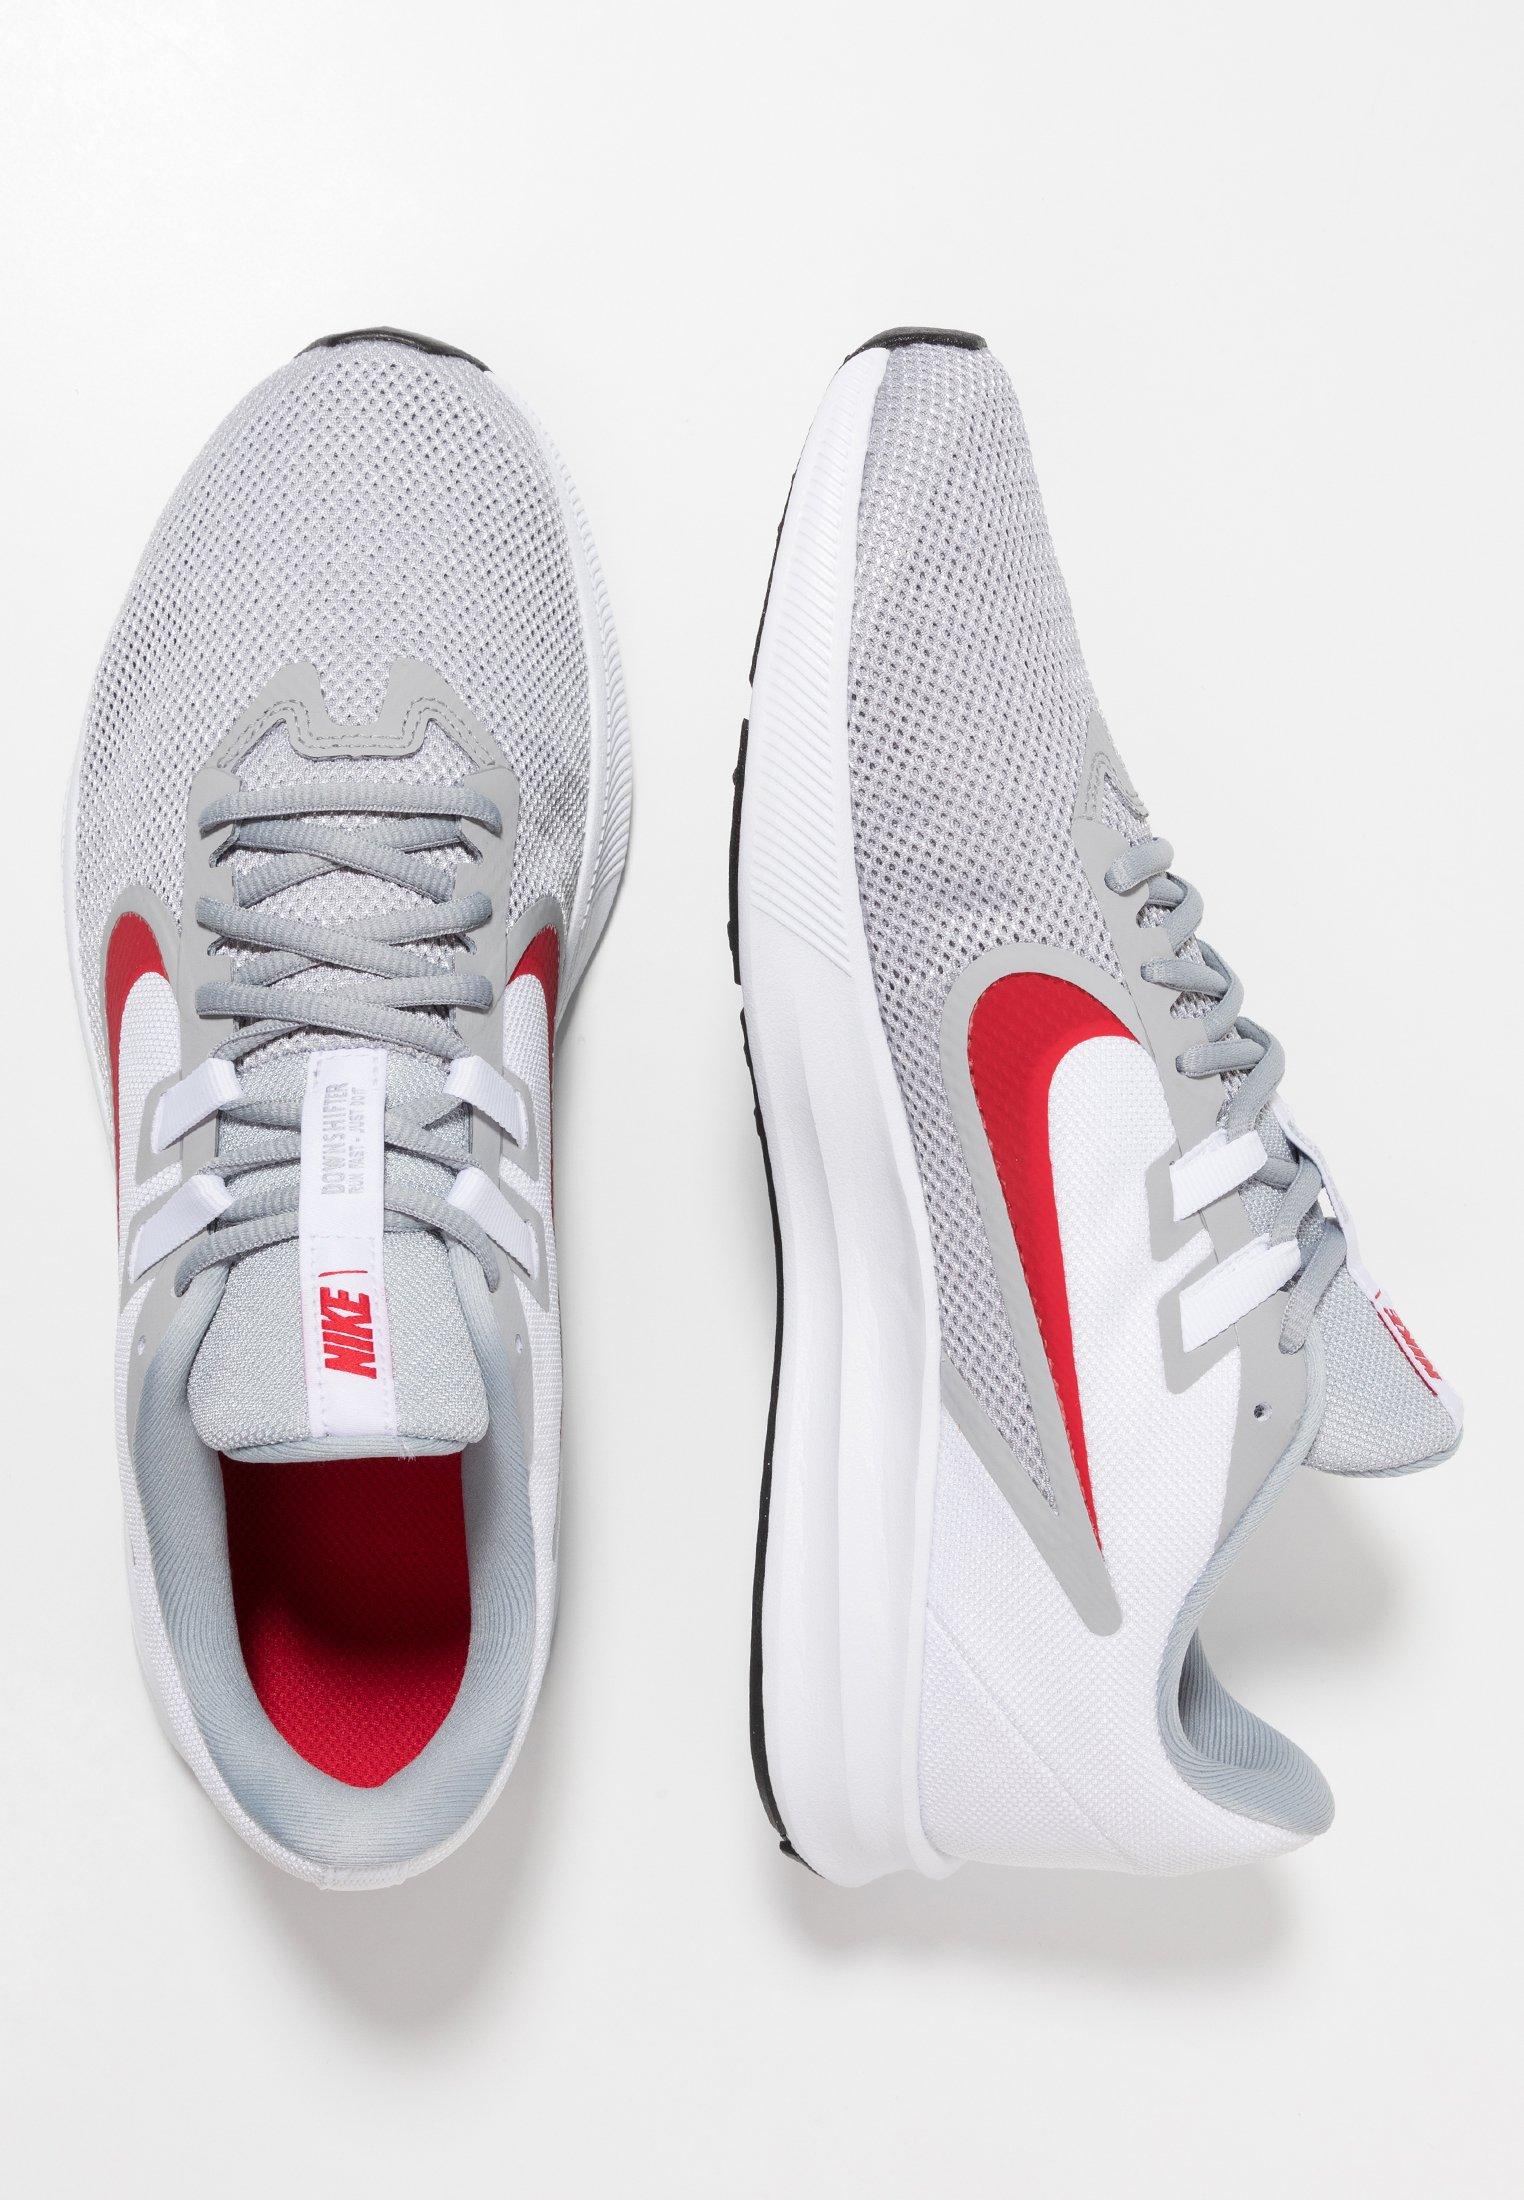 DOWNSHIFTER 9 Chaussures de running neutres wolf greyuniversity redwhiteblack